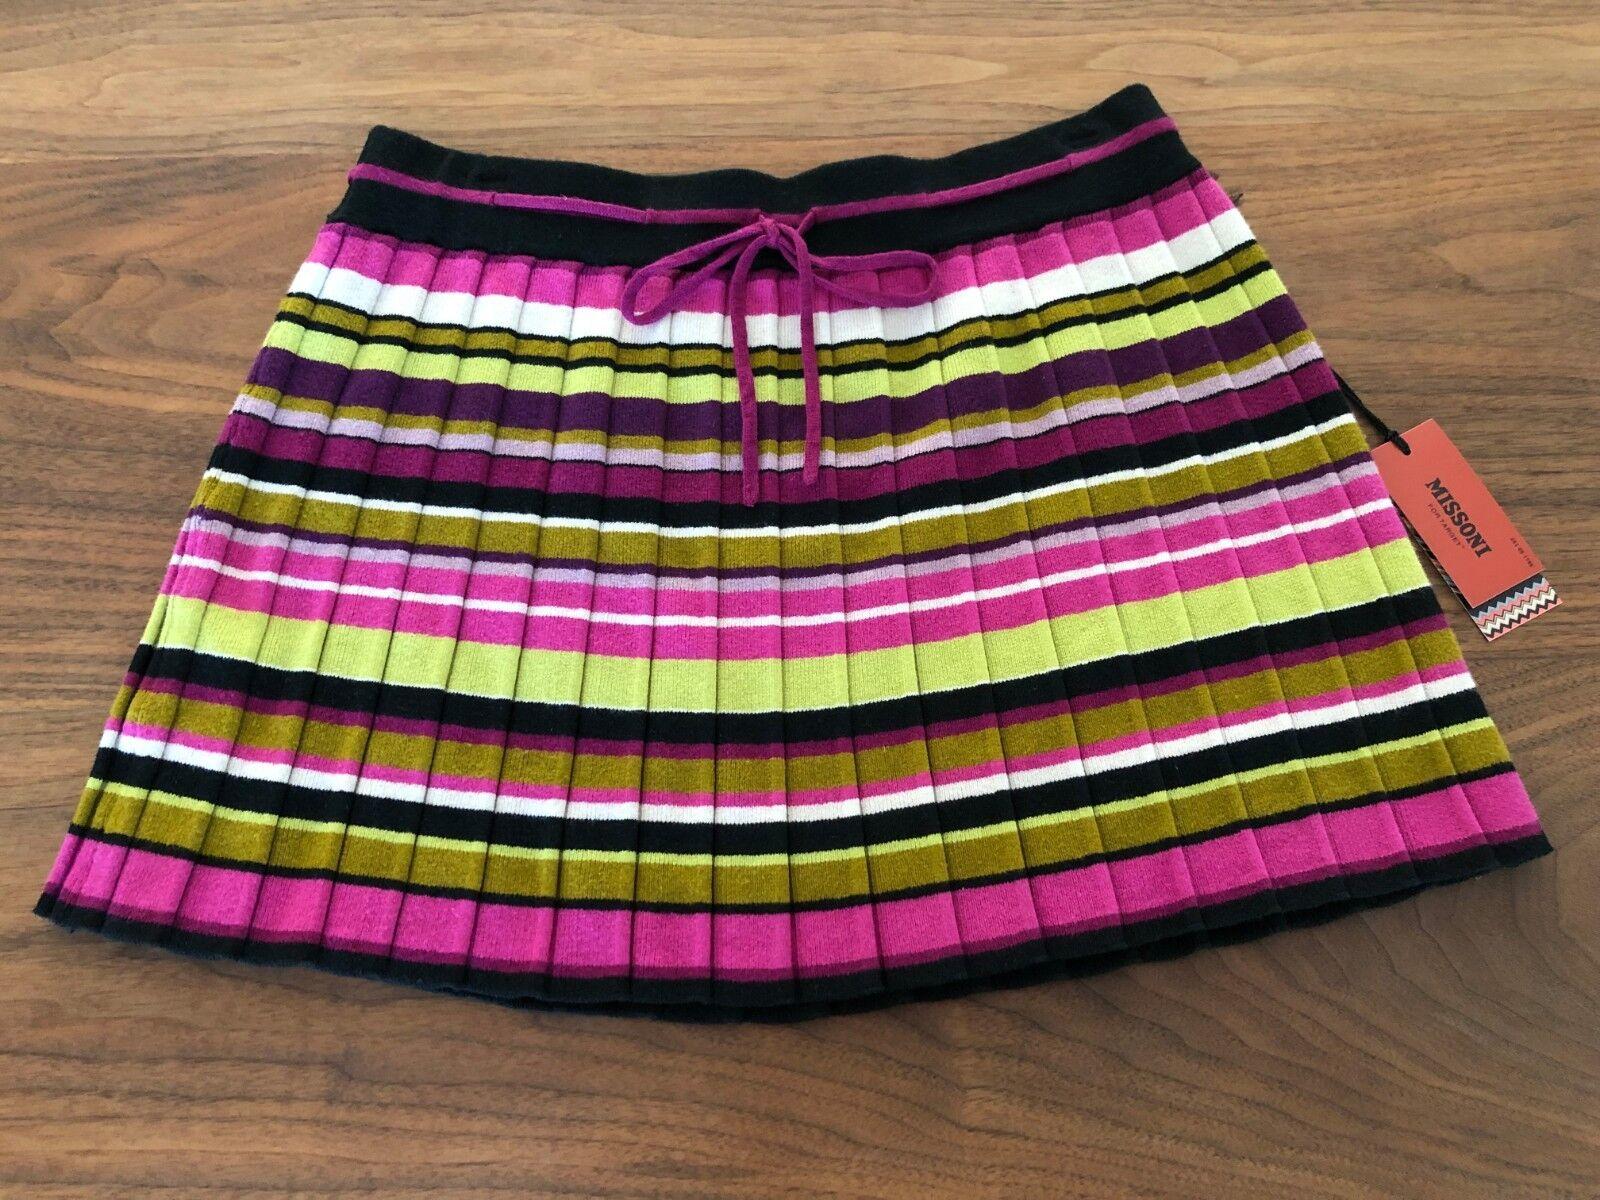 Brand New NWT Missoni Target Pink Striped Pleated Sweater Skirt Medium M 275189